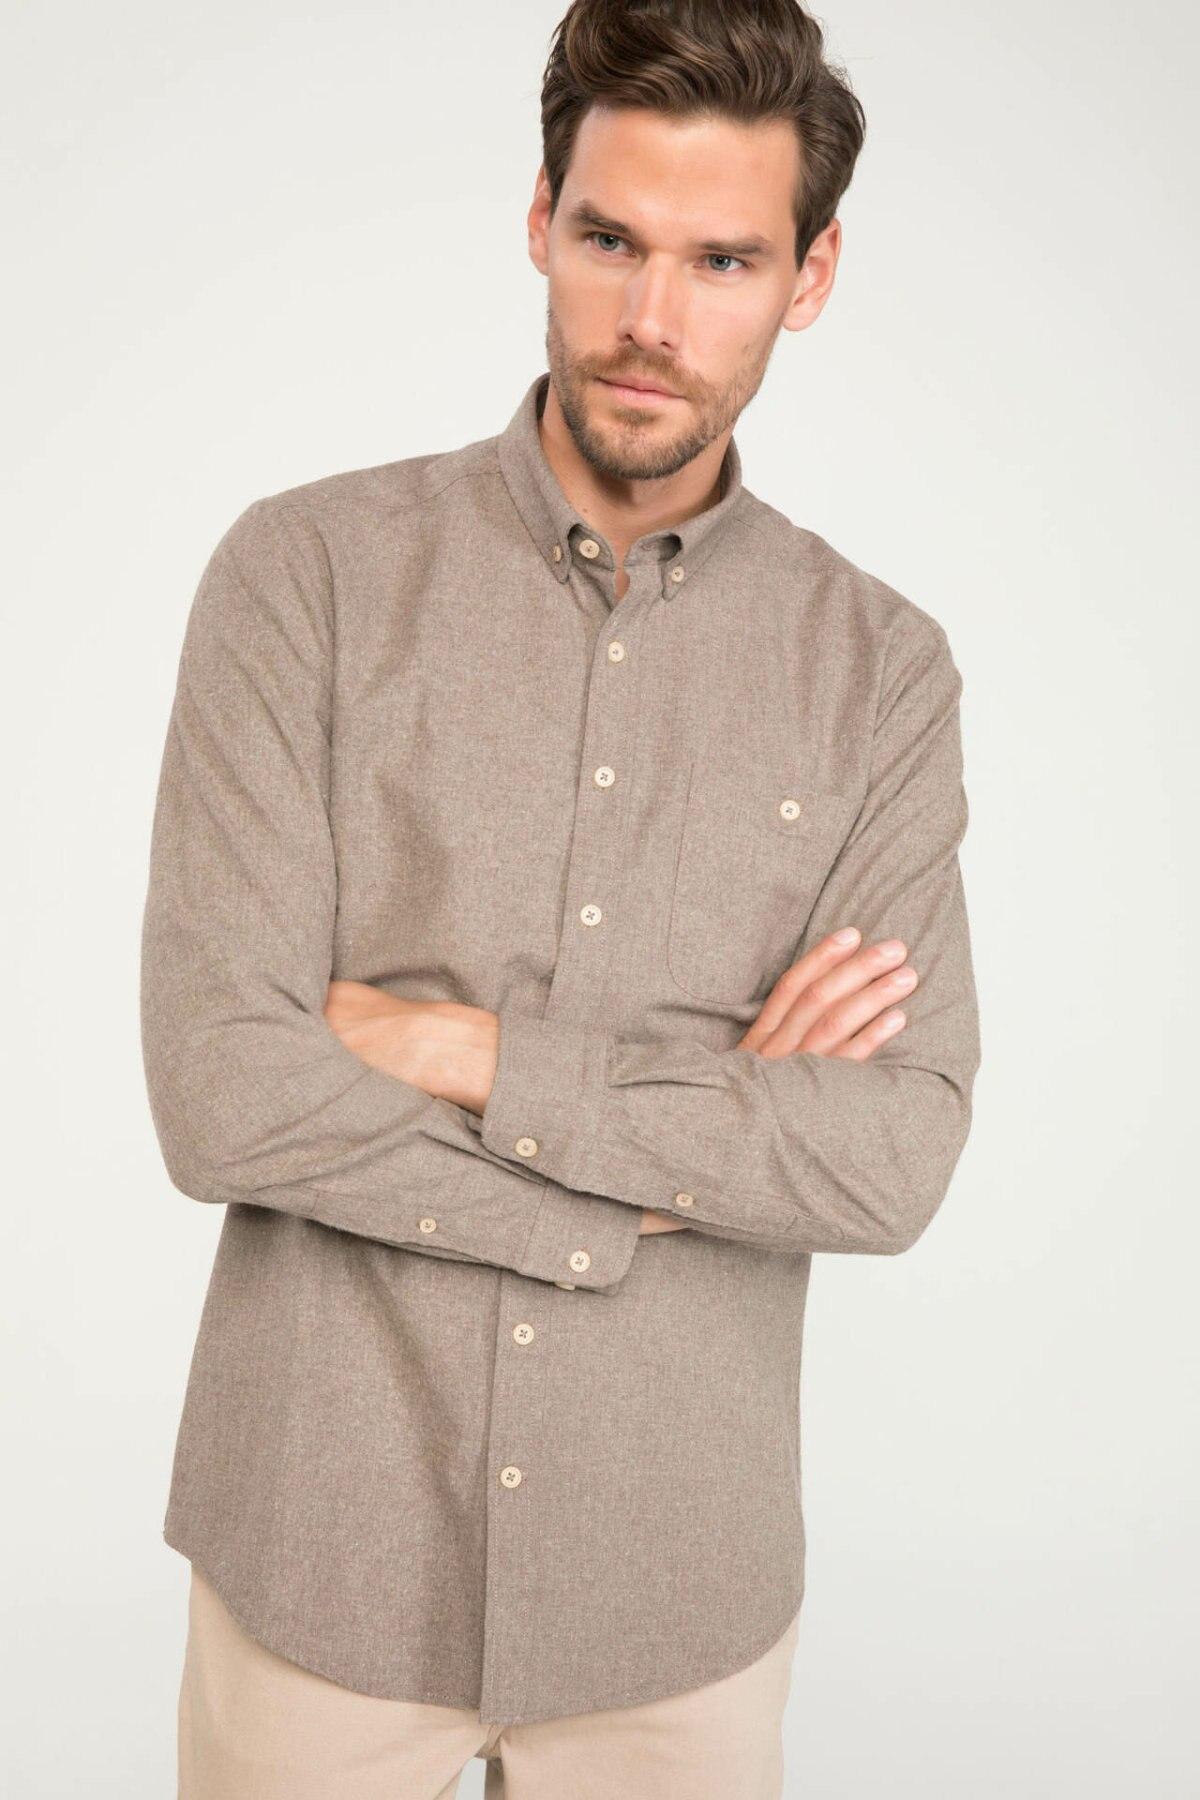 DeFacto Man Solid Color Turn-down Collar Long Sleeve Shirt Men's Autumn Pockets Decors Top Shirts-J1528AZ18WN